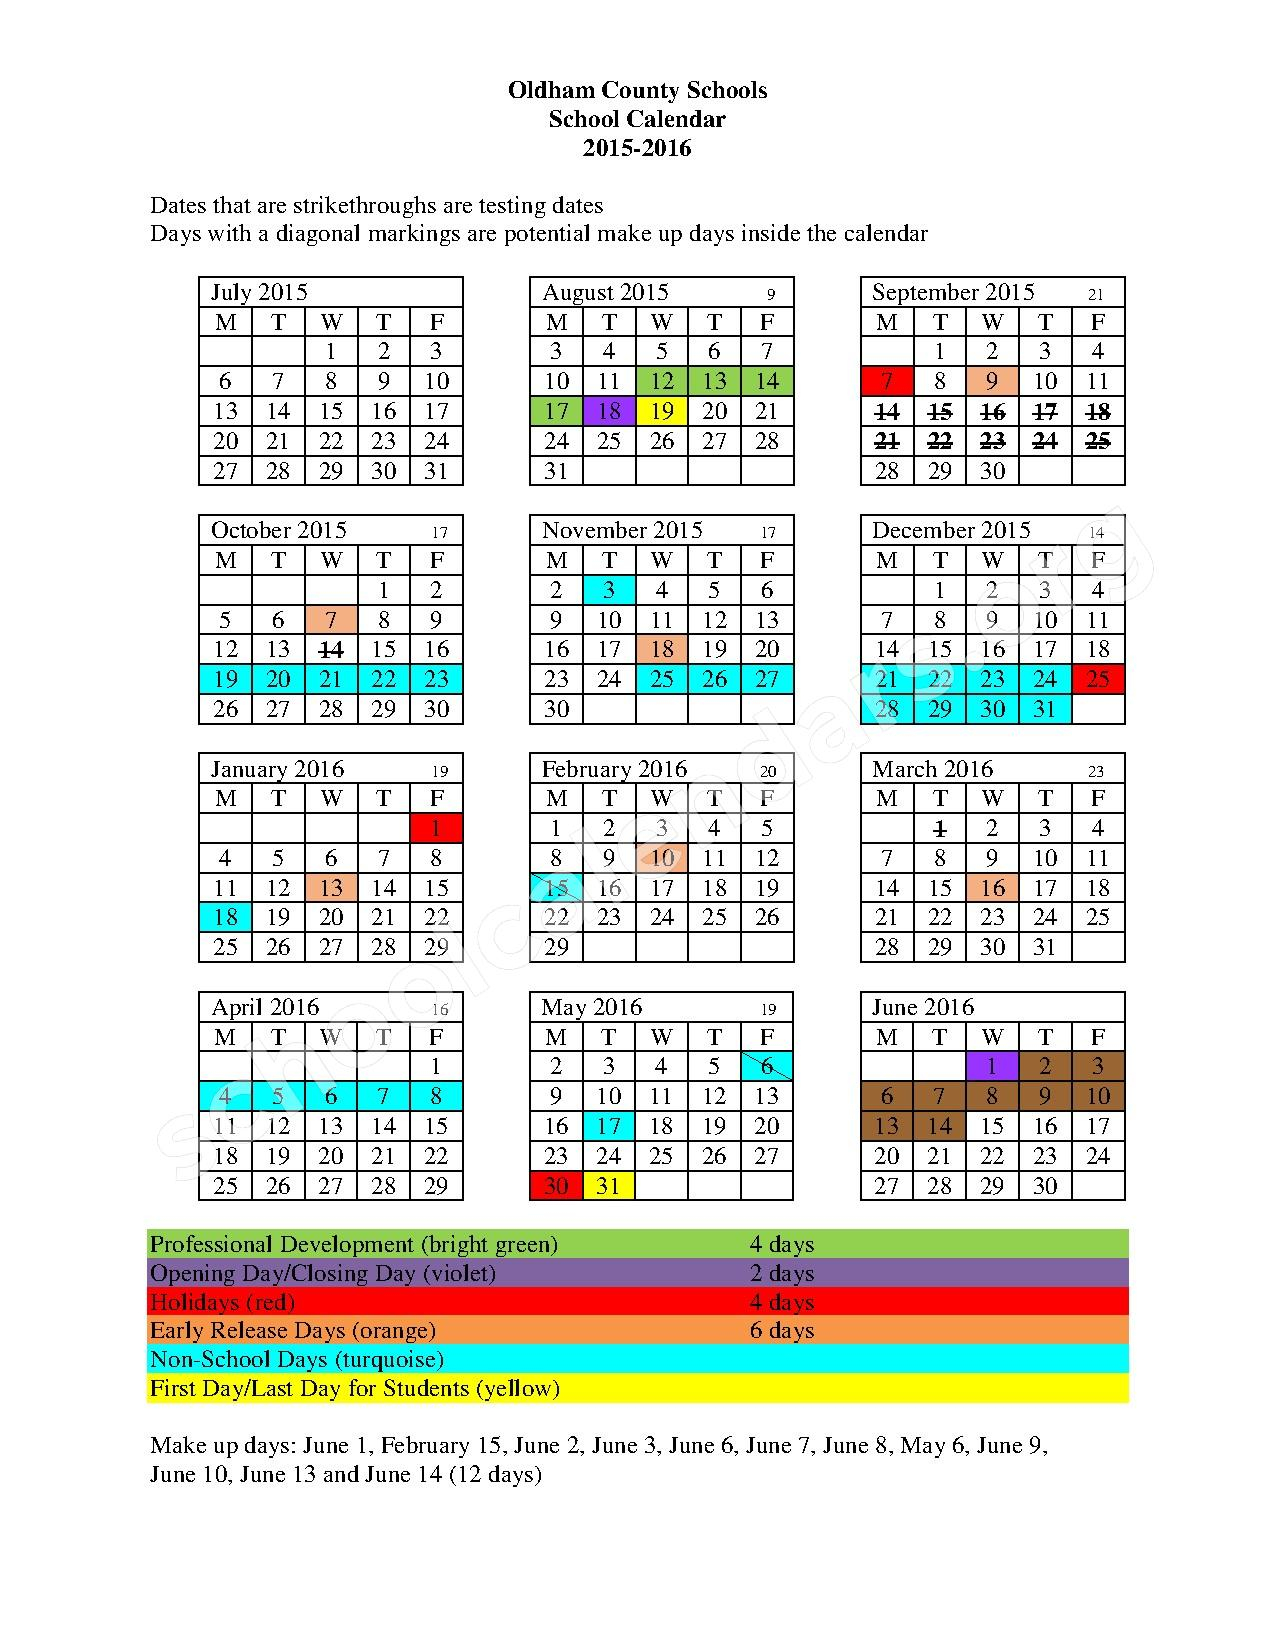 2015 - 2016 School Calendar | South Oldham High School With Aiken High School Sc Calendar For 2015